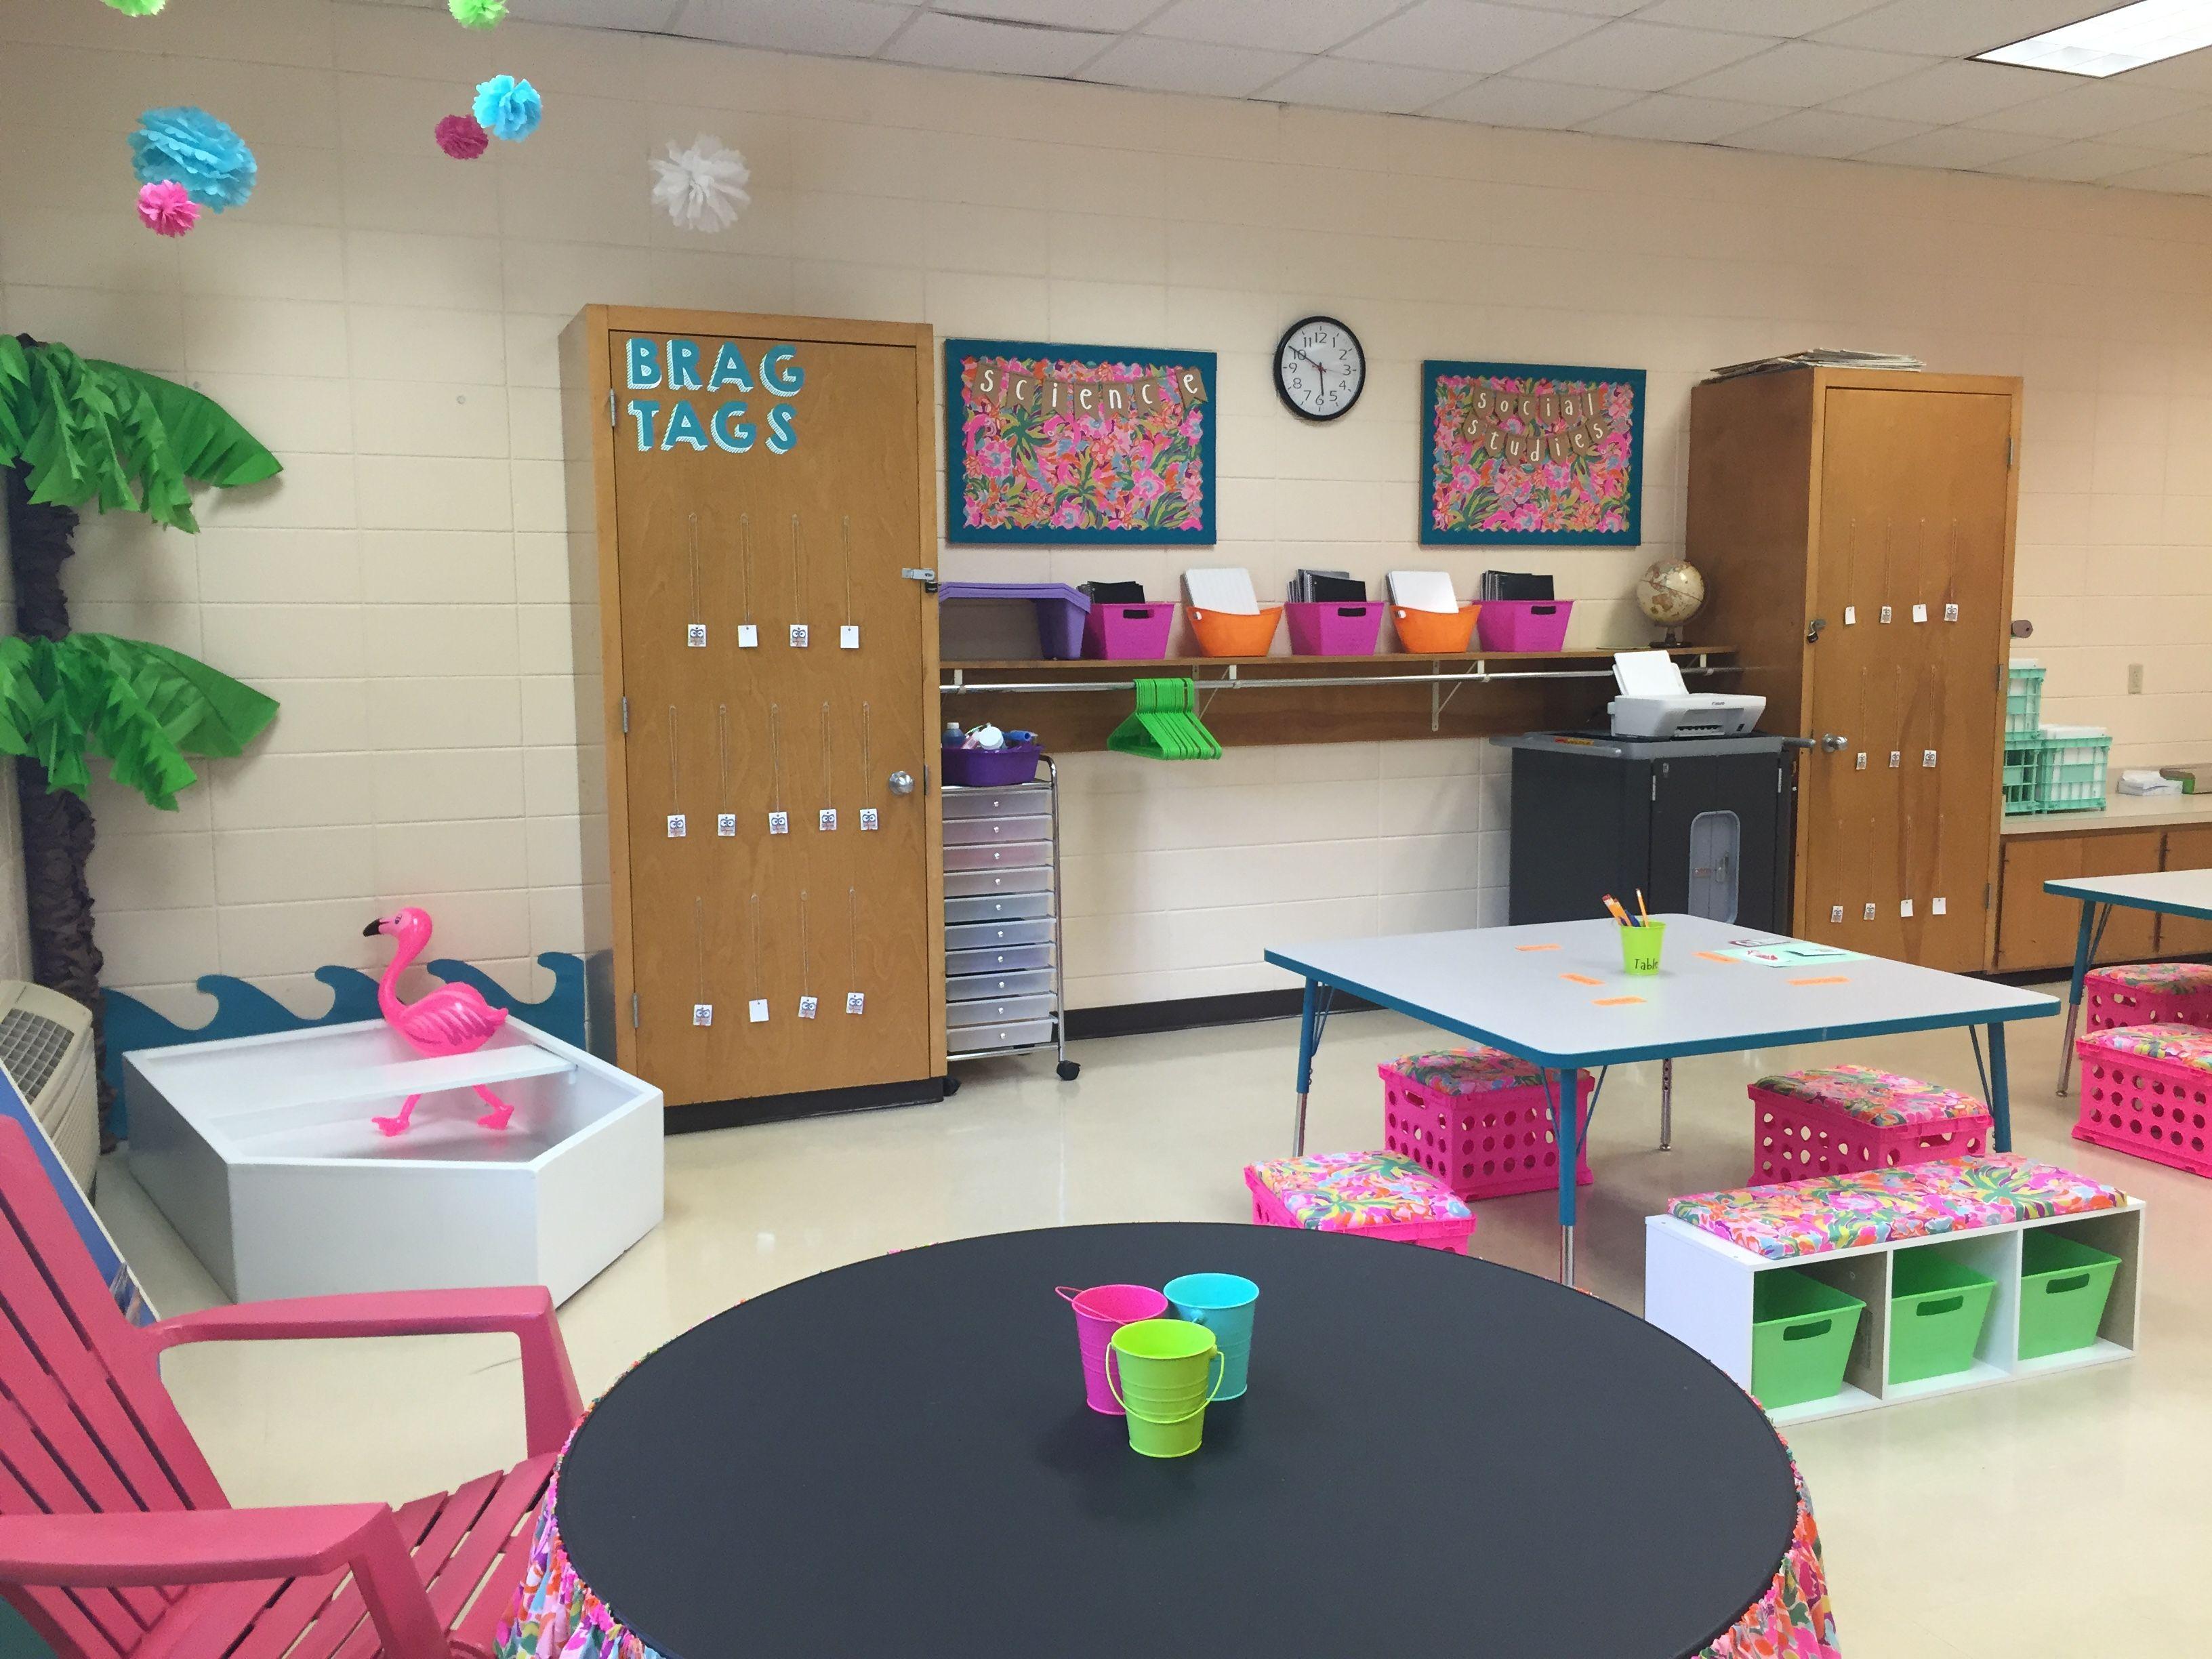 lilly pulitzer and flamingo themed classroom i m so in love with lilly pulitzer and flamingo themed classroom i m so in love with how it